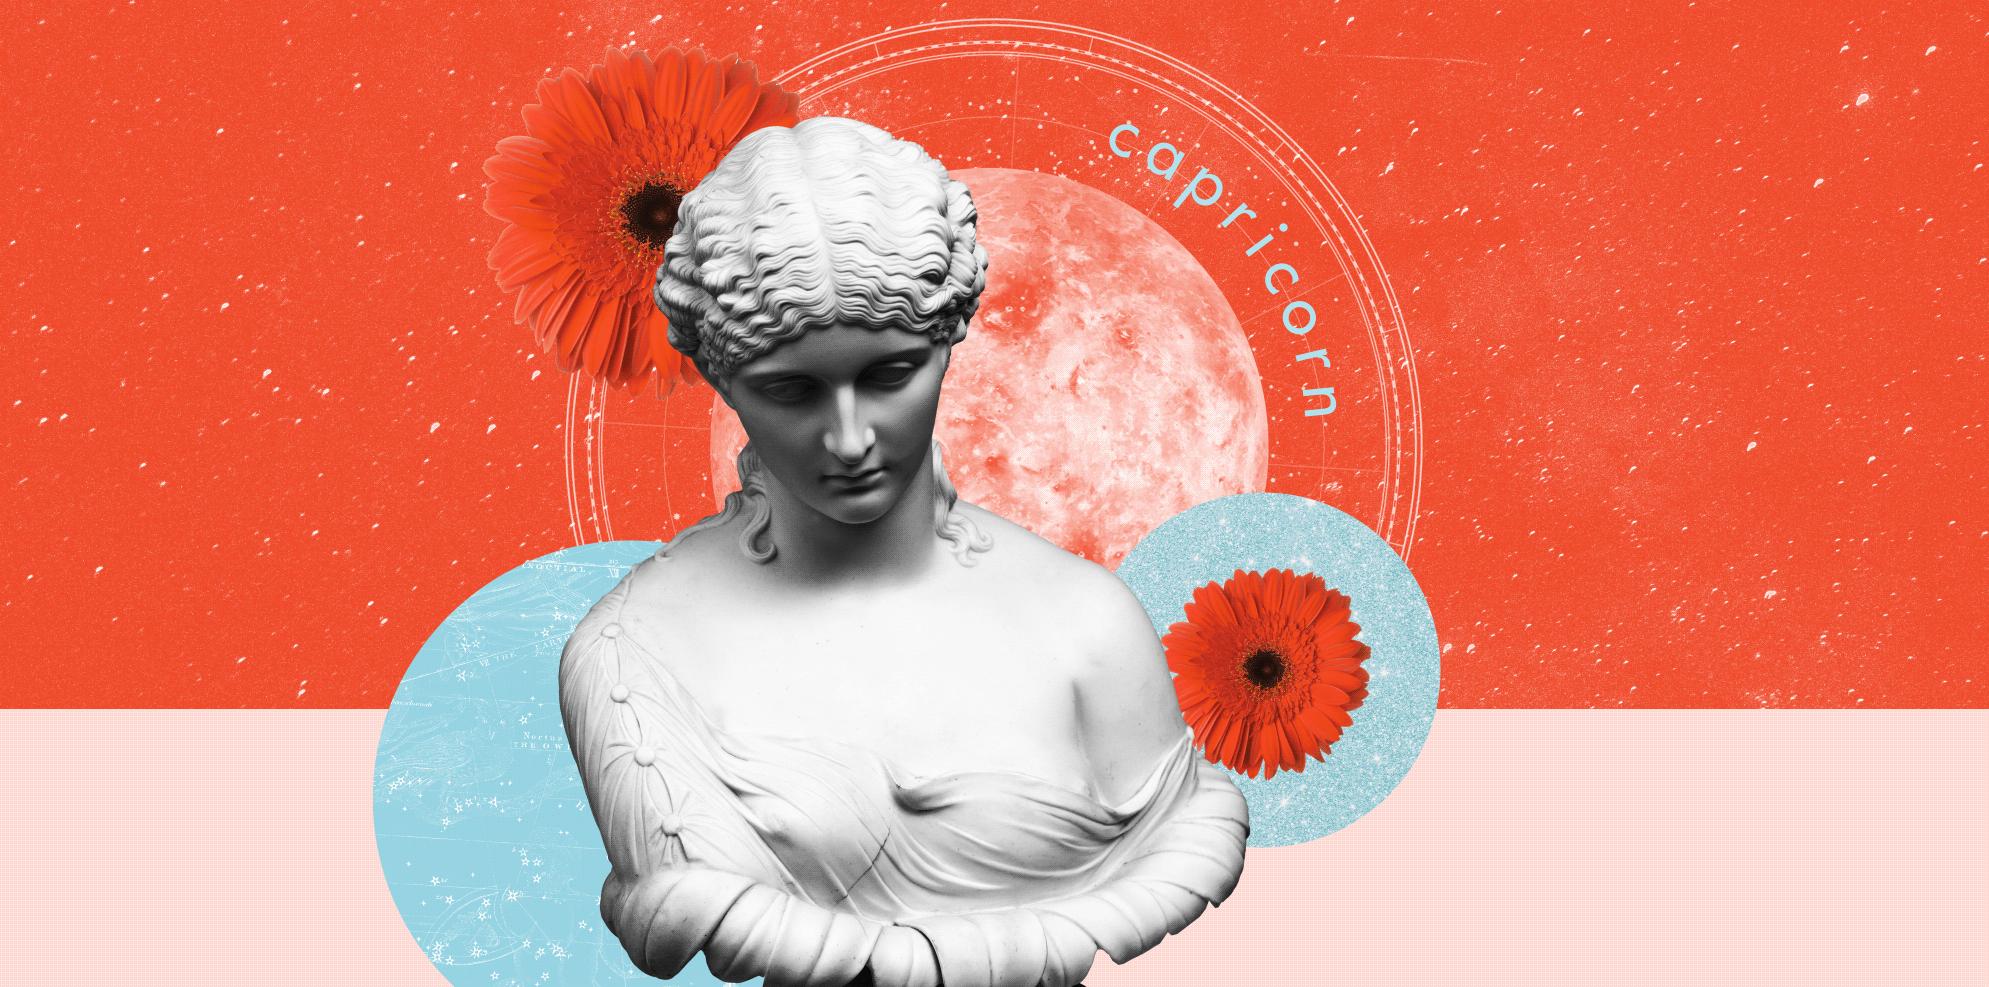 Capricorn 2020 horoscope